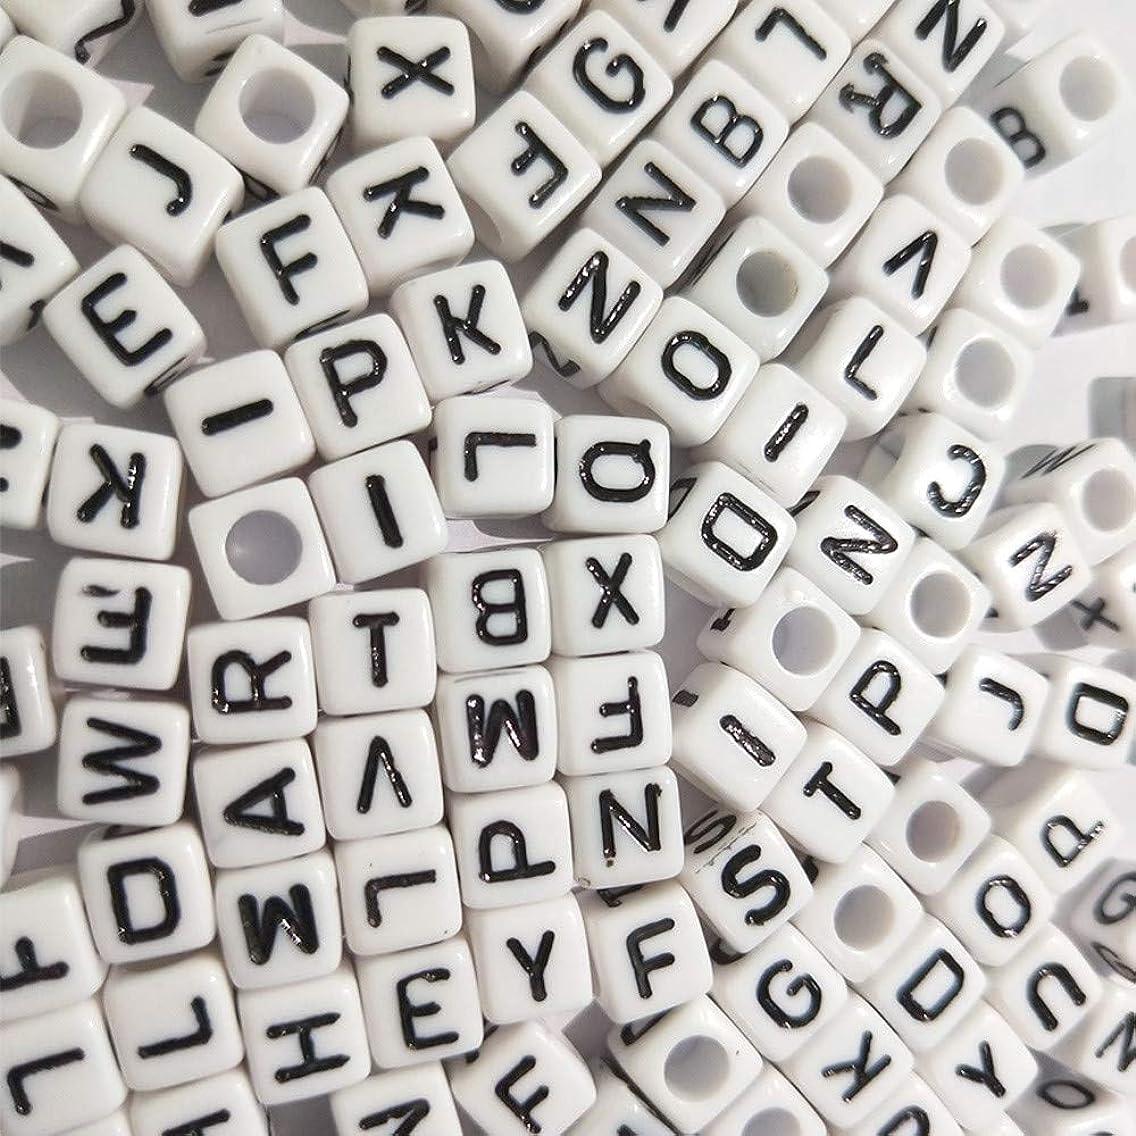 XGuangage 6x6mm Acrylic Plastic Loose Beads Alphabet Letter Cube Beads for DIY Bracelet Necklace Jewelry Making 200pcs (White, Cube)